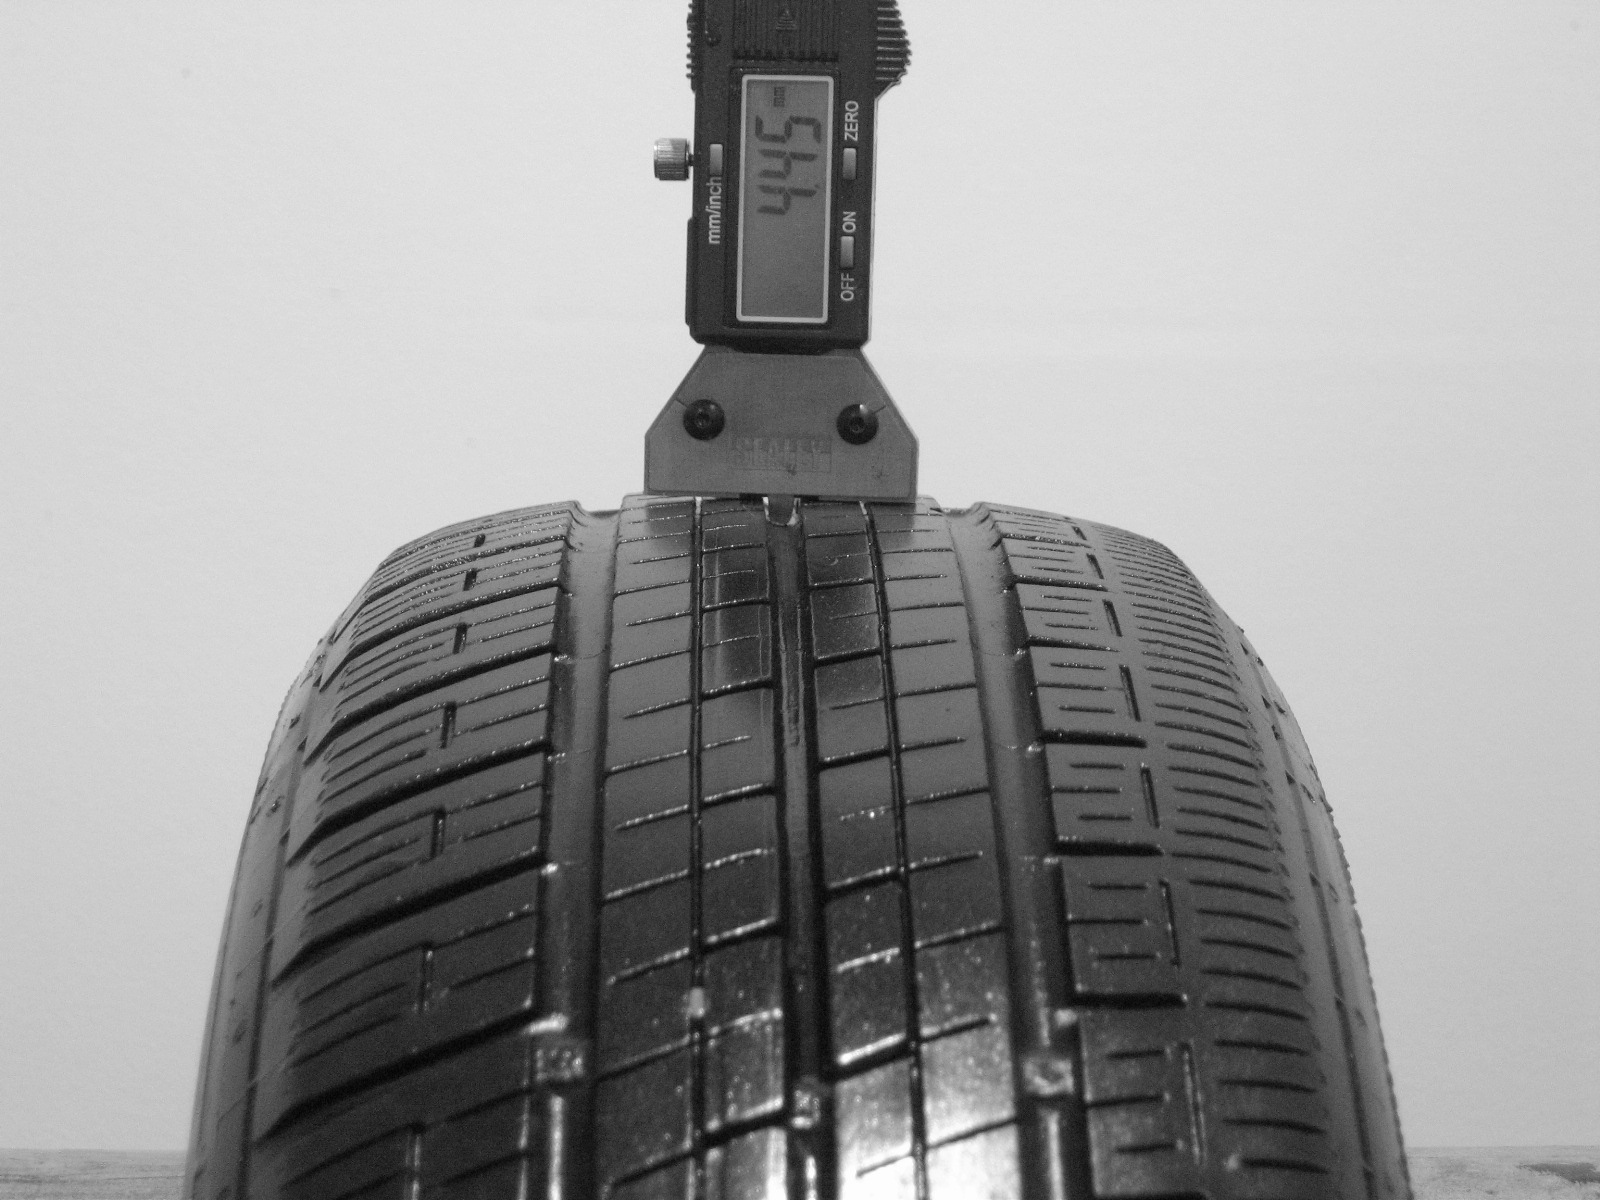 Použité-Pneu-Bazar - 165/70 R14 DUNLOP SP10A 3mm